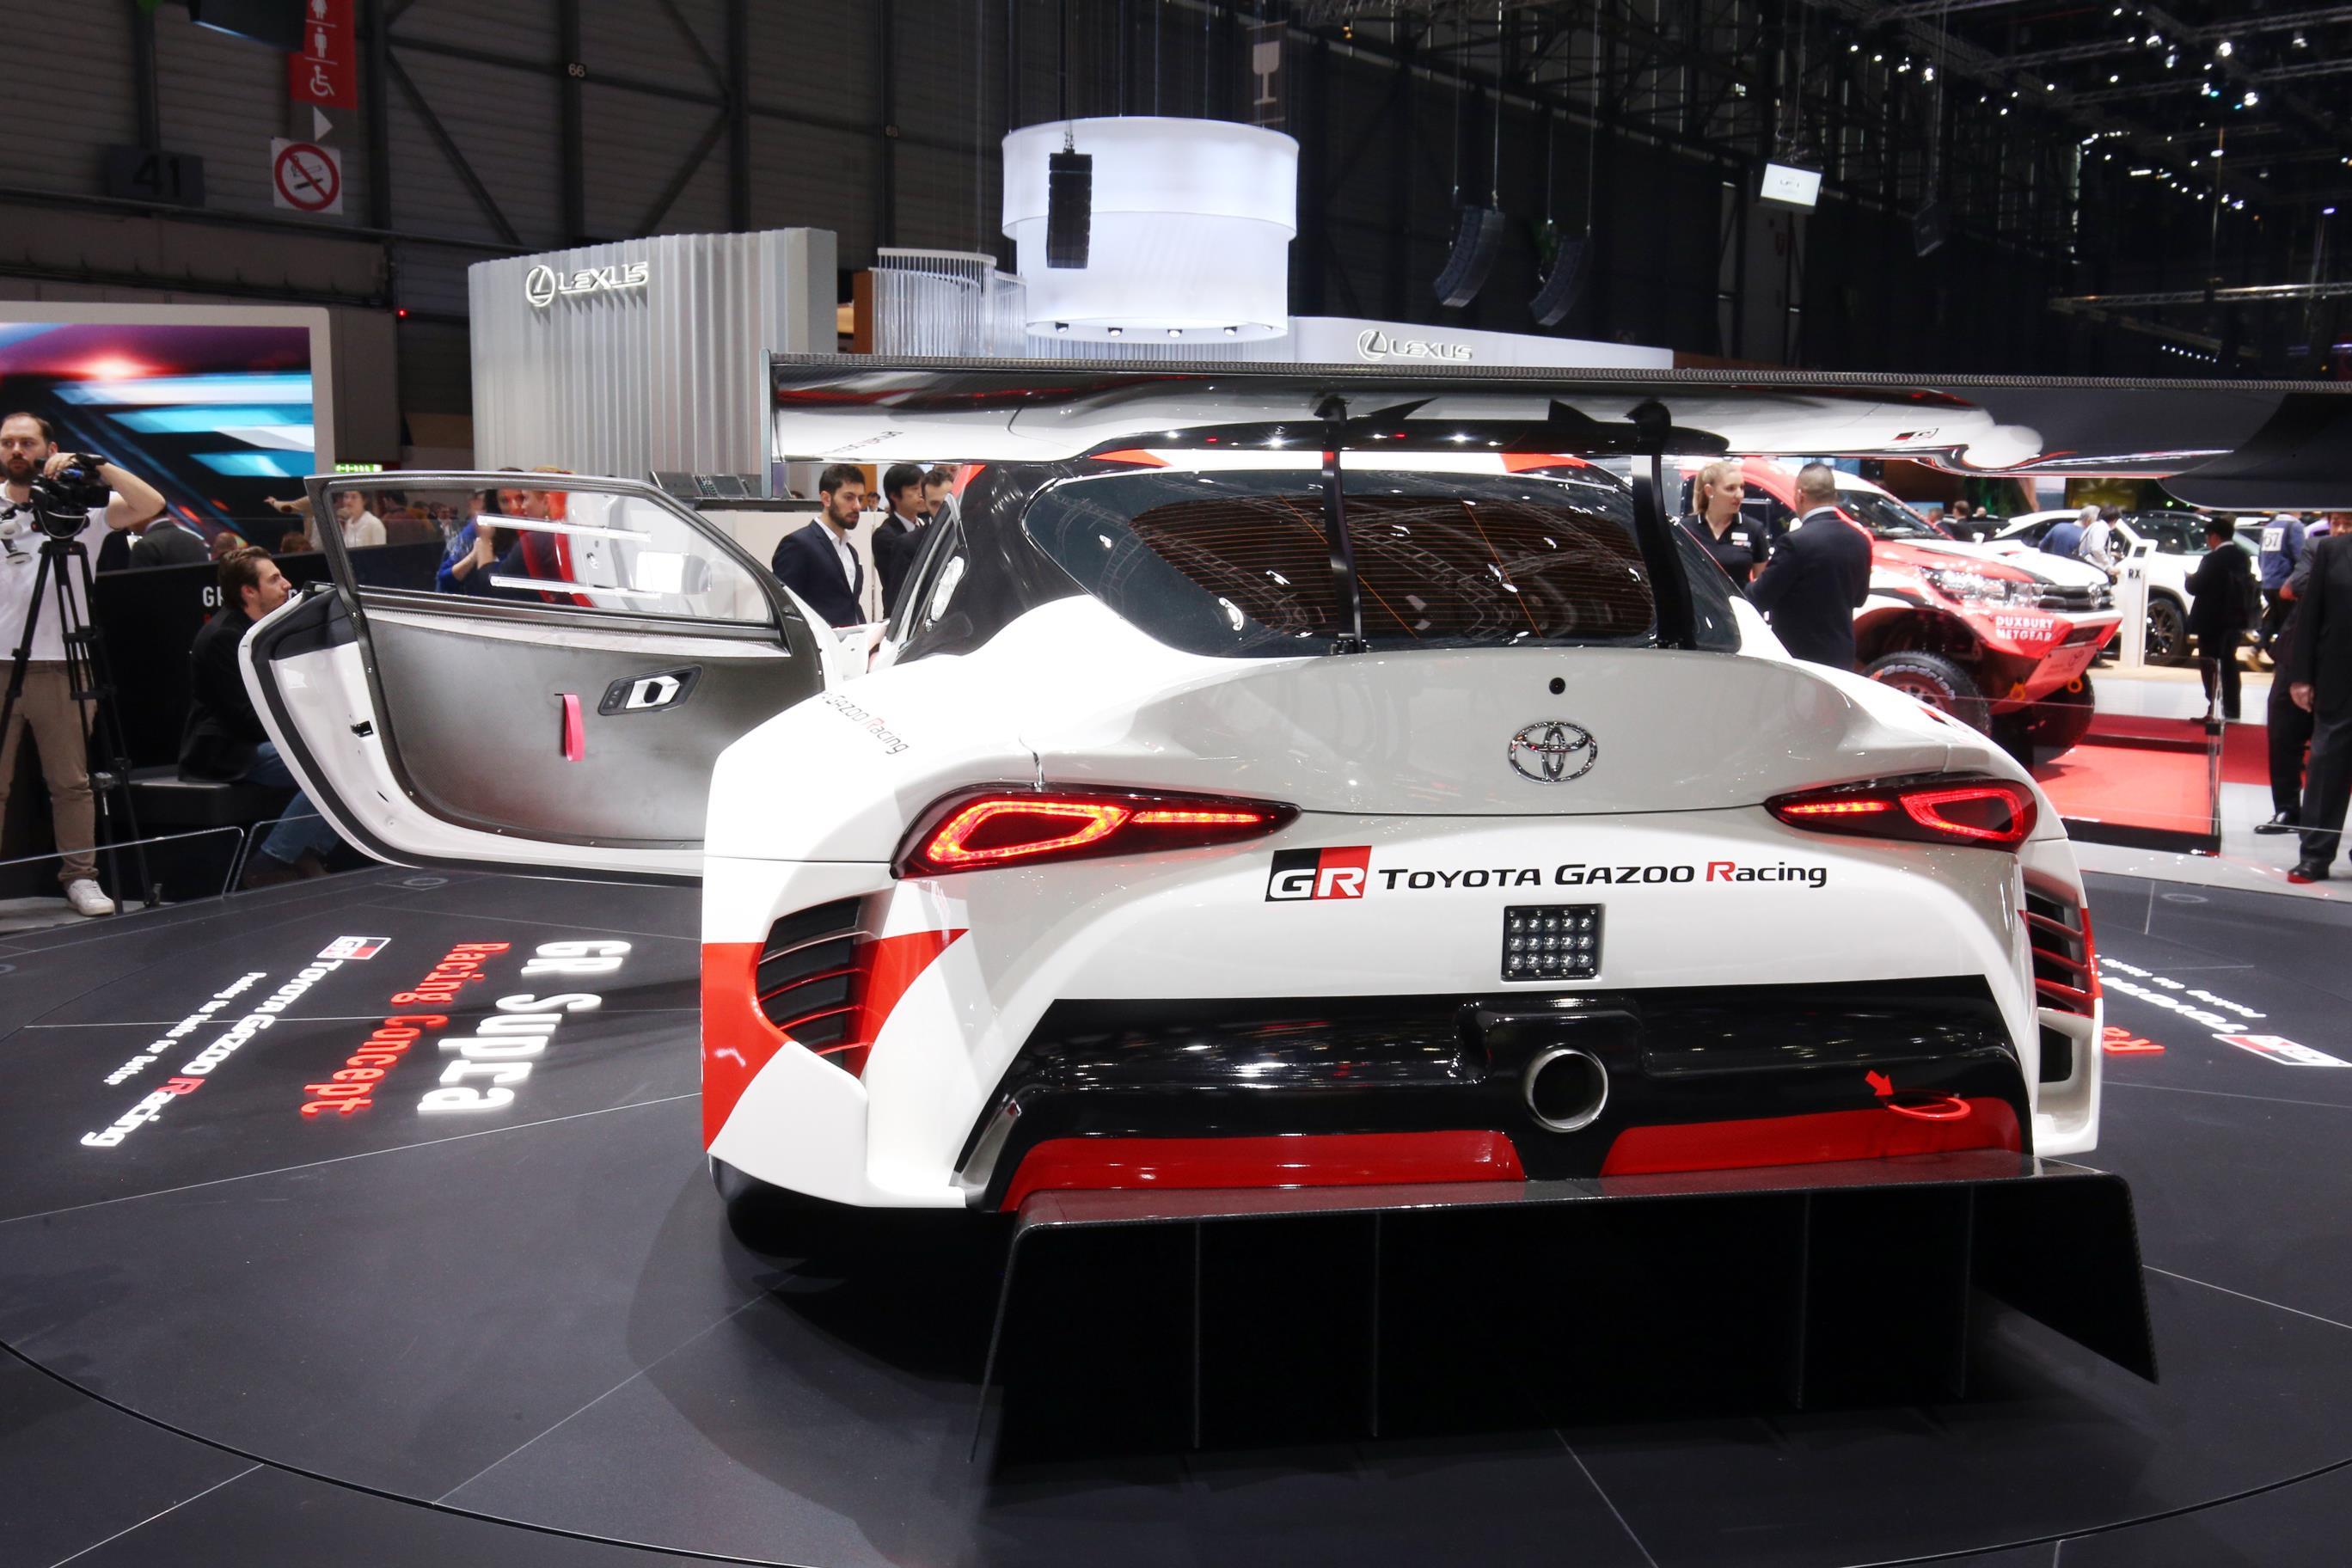 Geneva Motor Show 2018 Mega Gallery Part 1 (329)